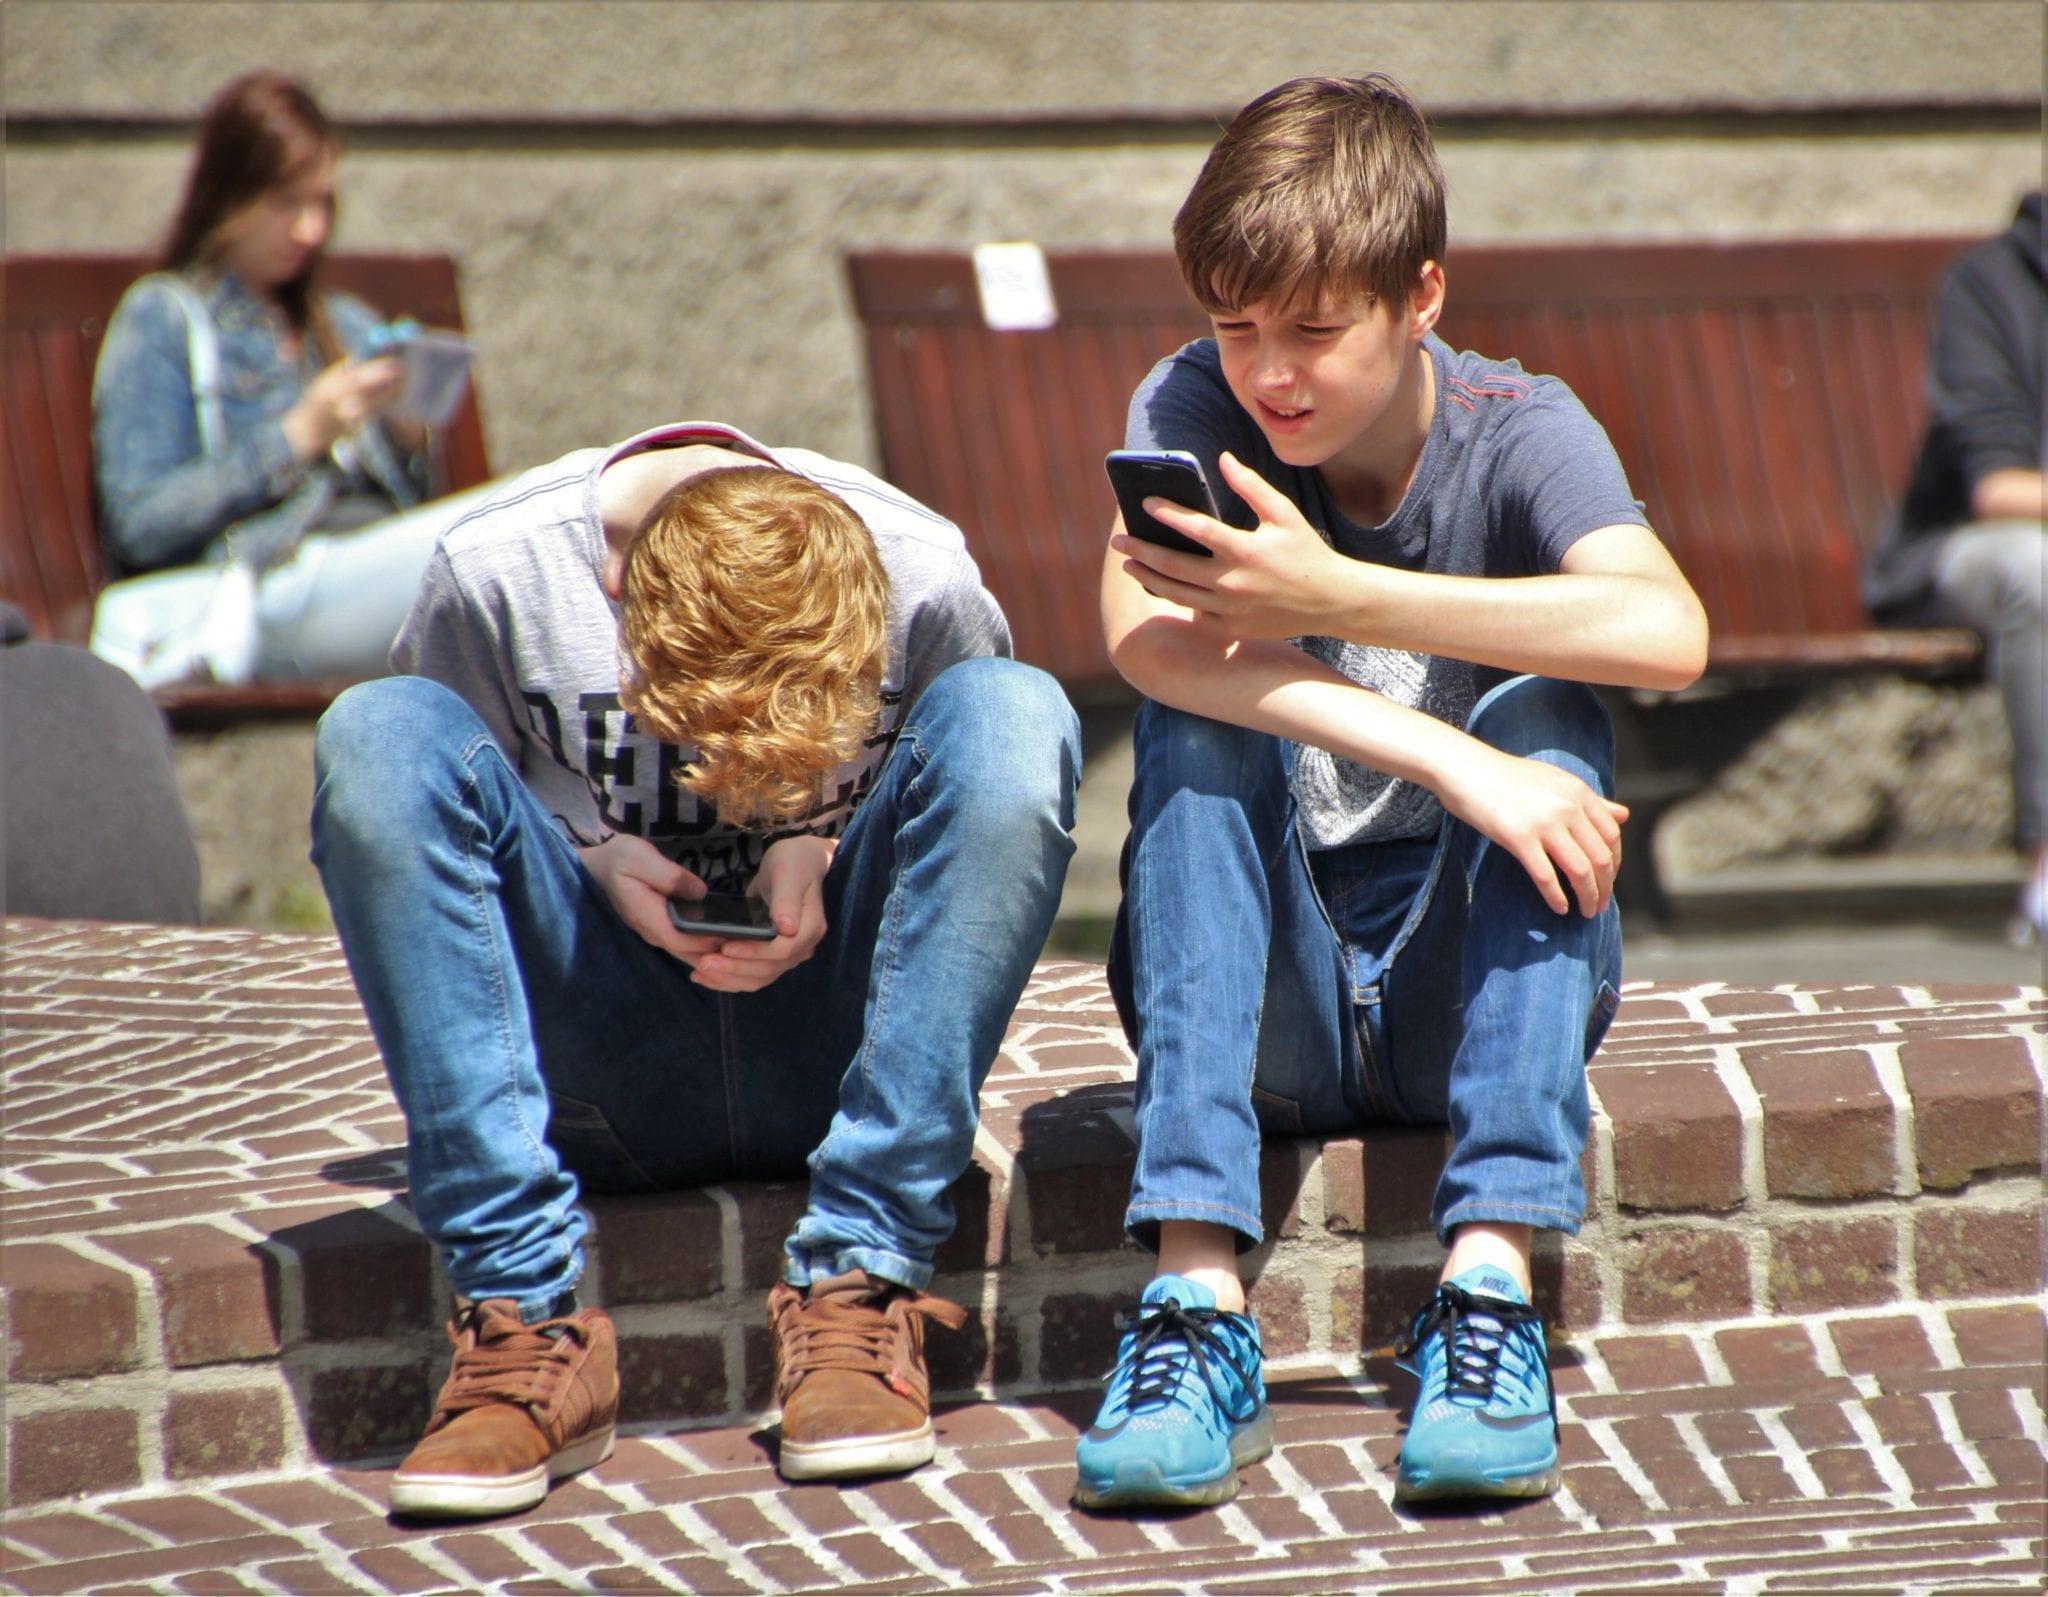 Jovens no telemóvel